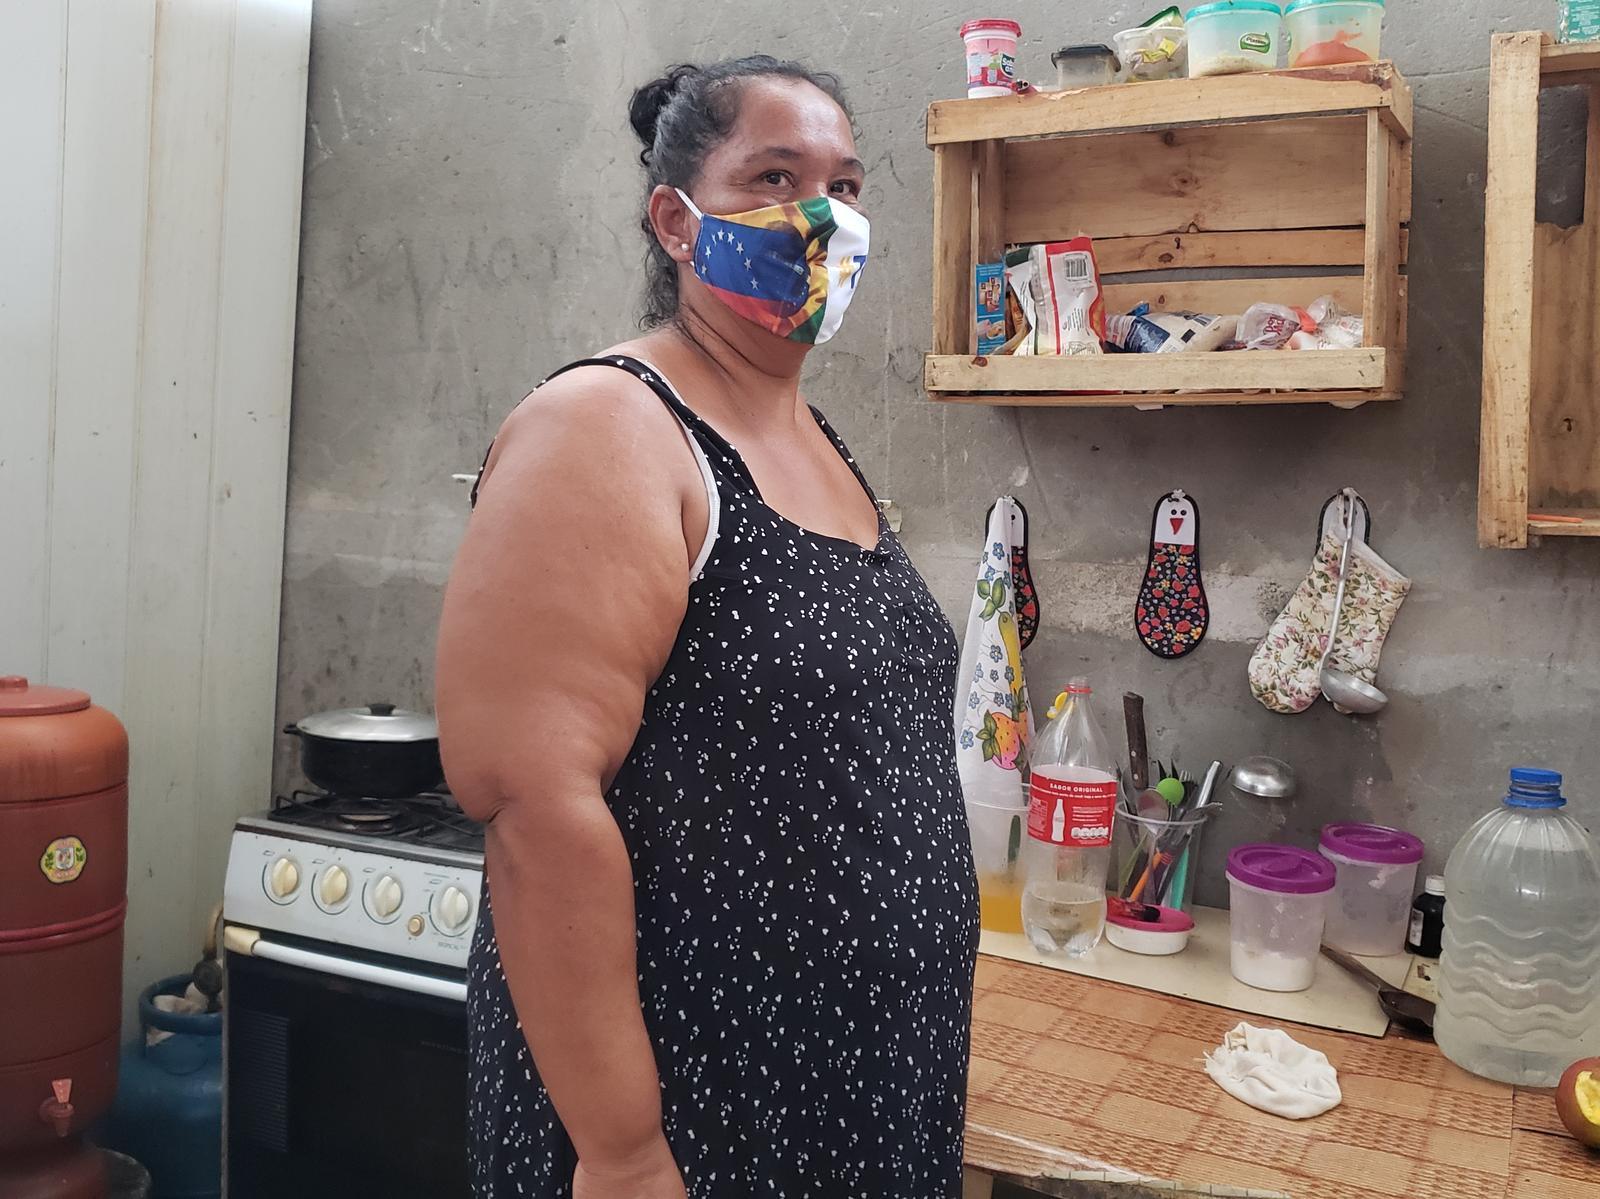 Brasil world vision proyecto mujer